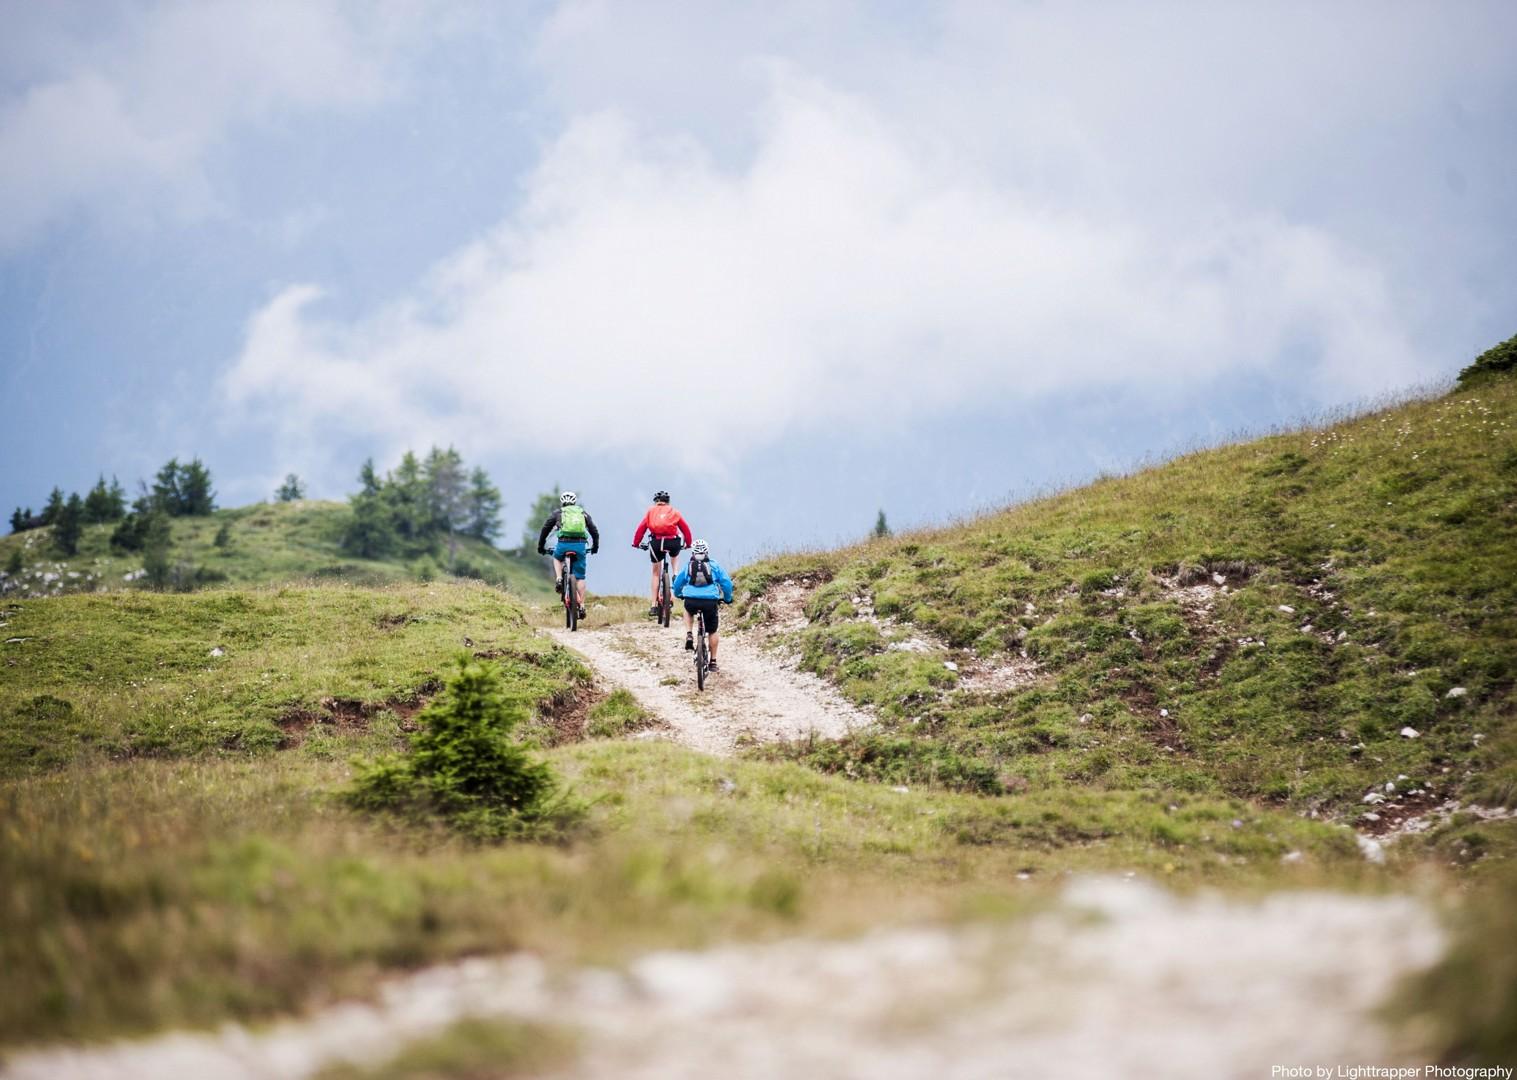 haute-savoy-mountain-bike-holiday-in-the-alps-alpine-adventure.jpg - Italy and France - Alpine Adventure - Mountain Biking